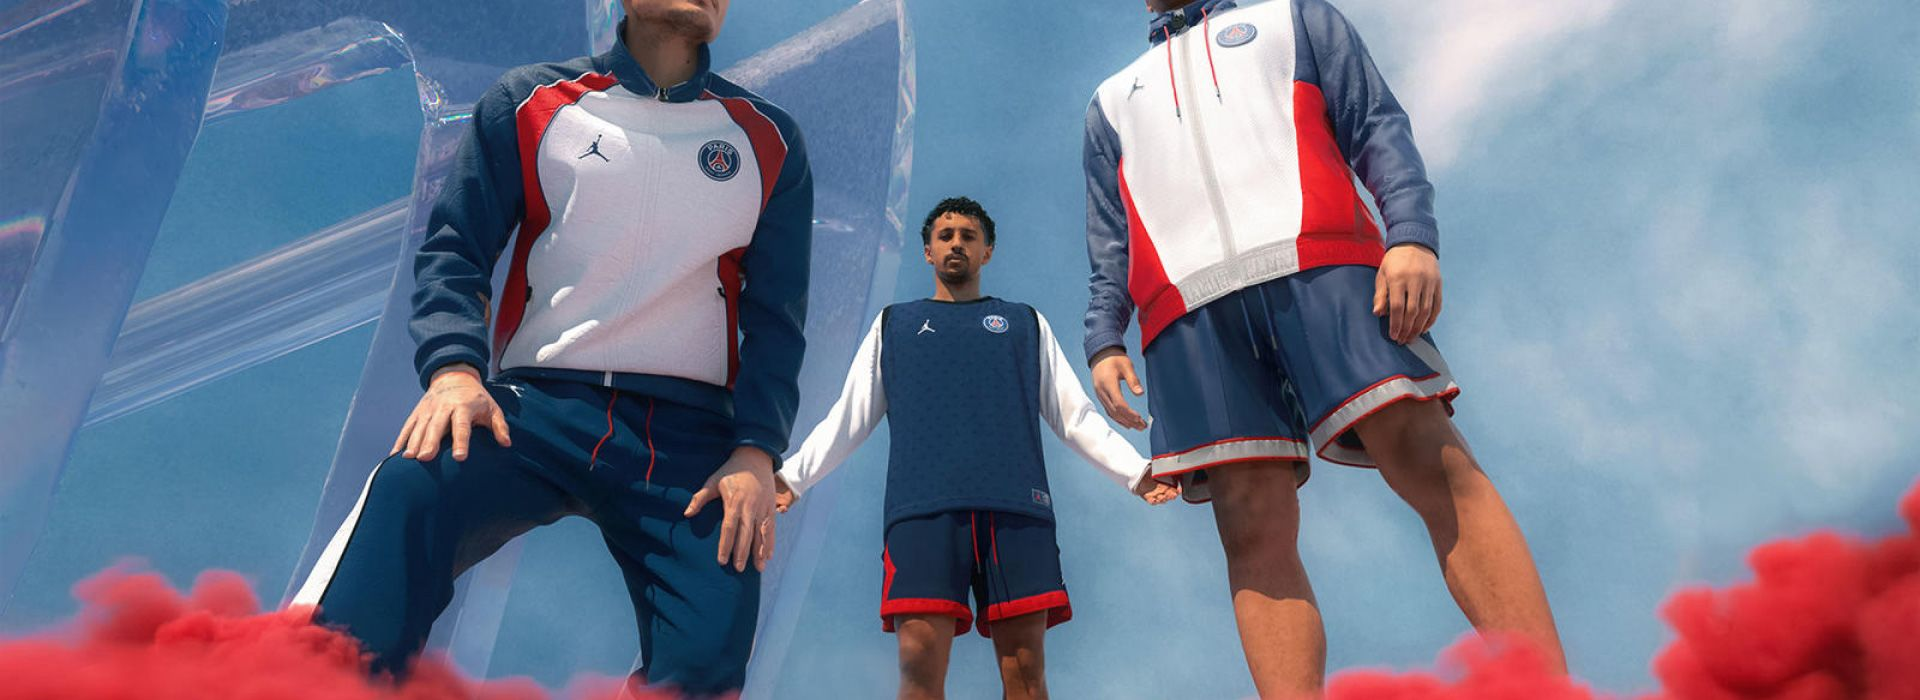 moda deportiva para todos